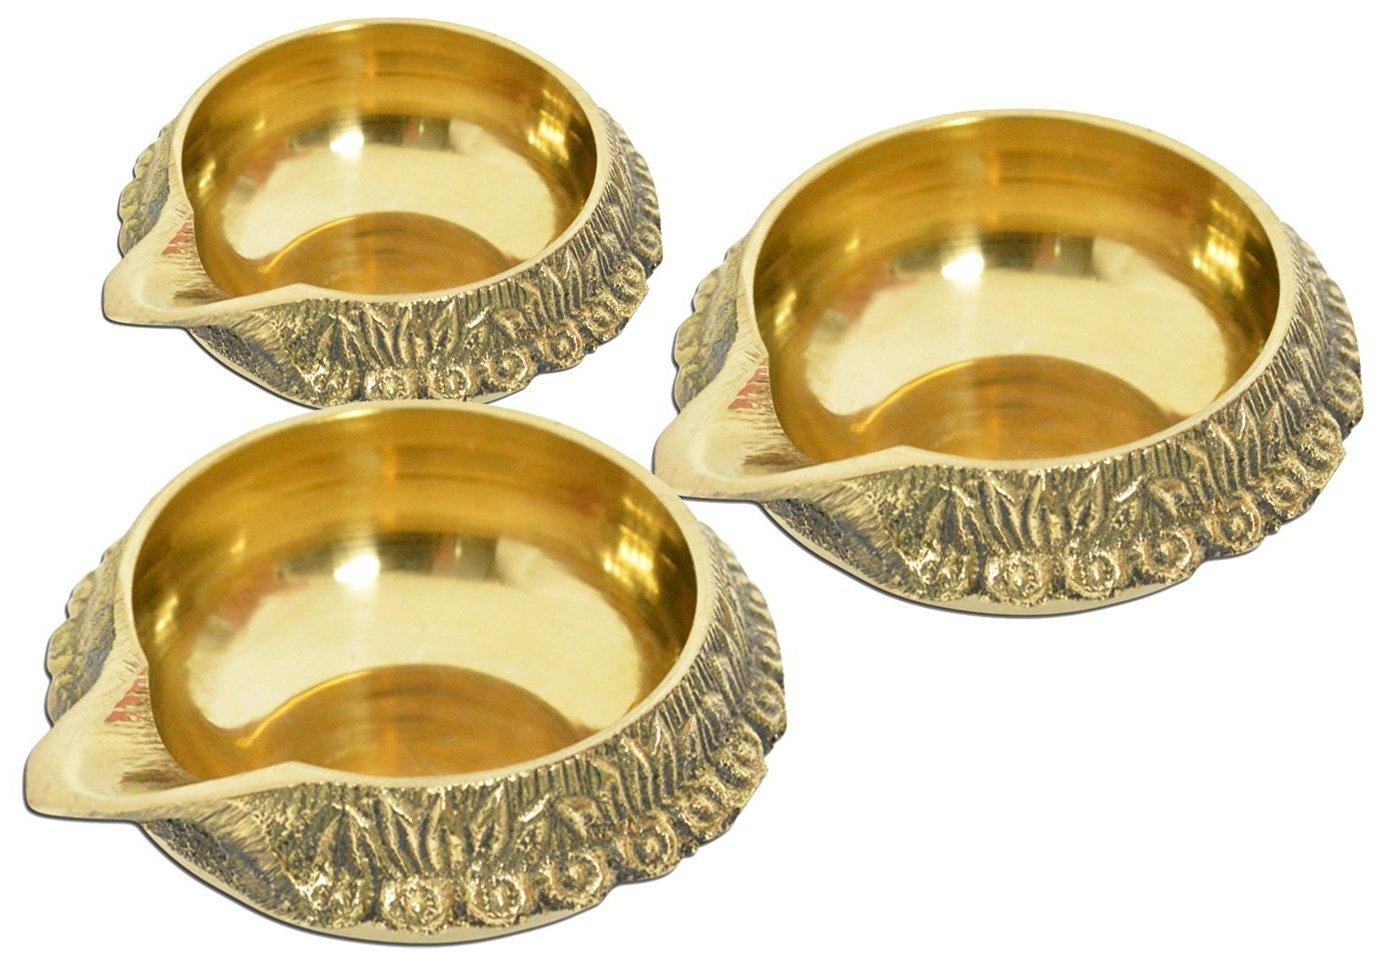 Artcollectibles India Set Of 3 beautiful Brass Diwali Kuber Diyas for Hindu Puja Prayer Religious Christmas Lighting